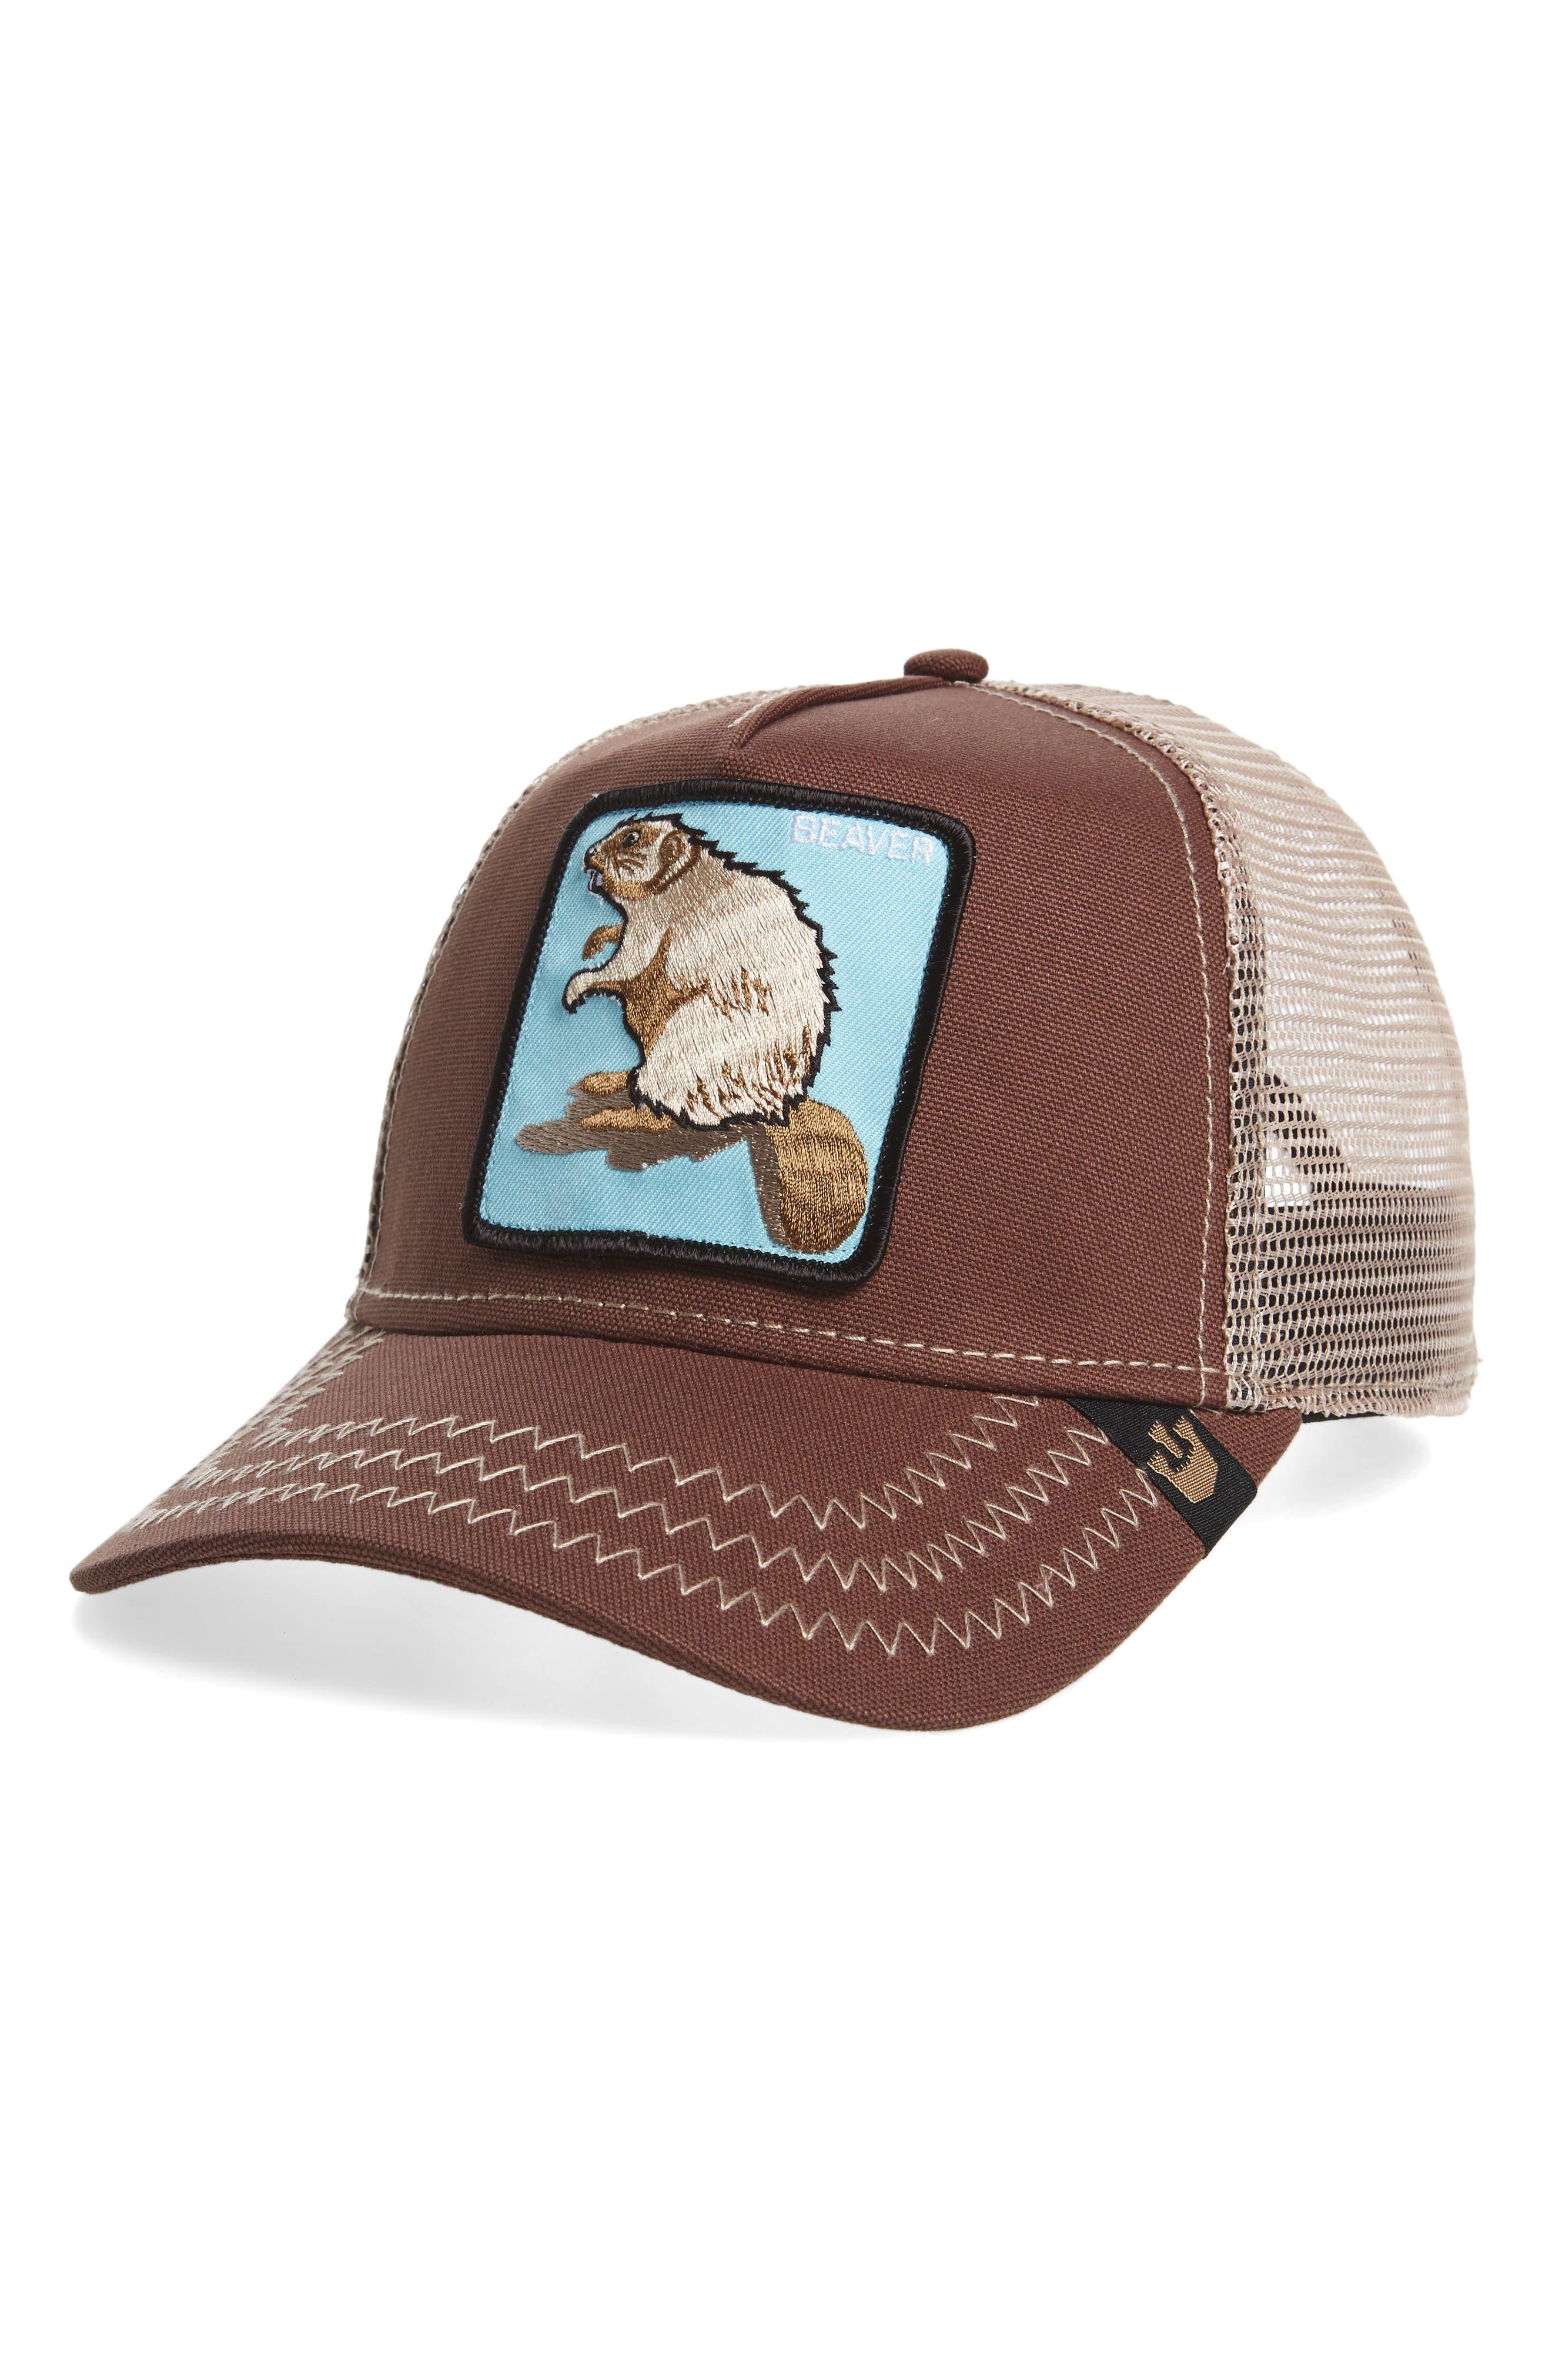 Animal Farm Beaver Mesh Trucker Hat,                         Main,                         color, BROWN